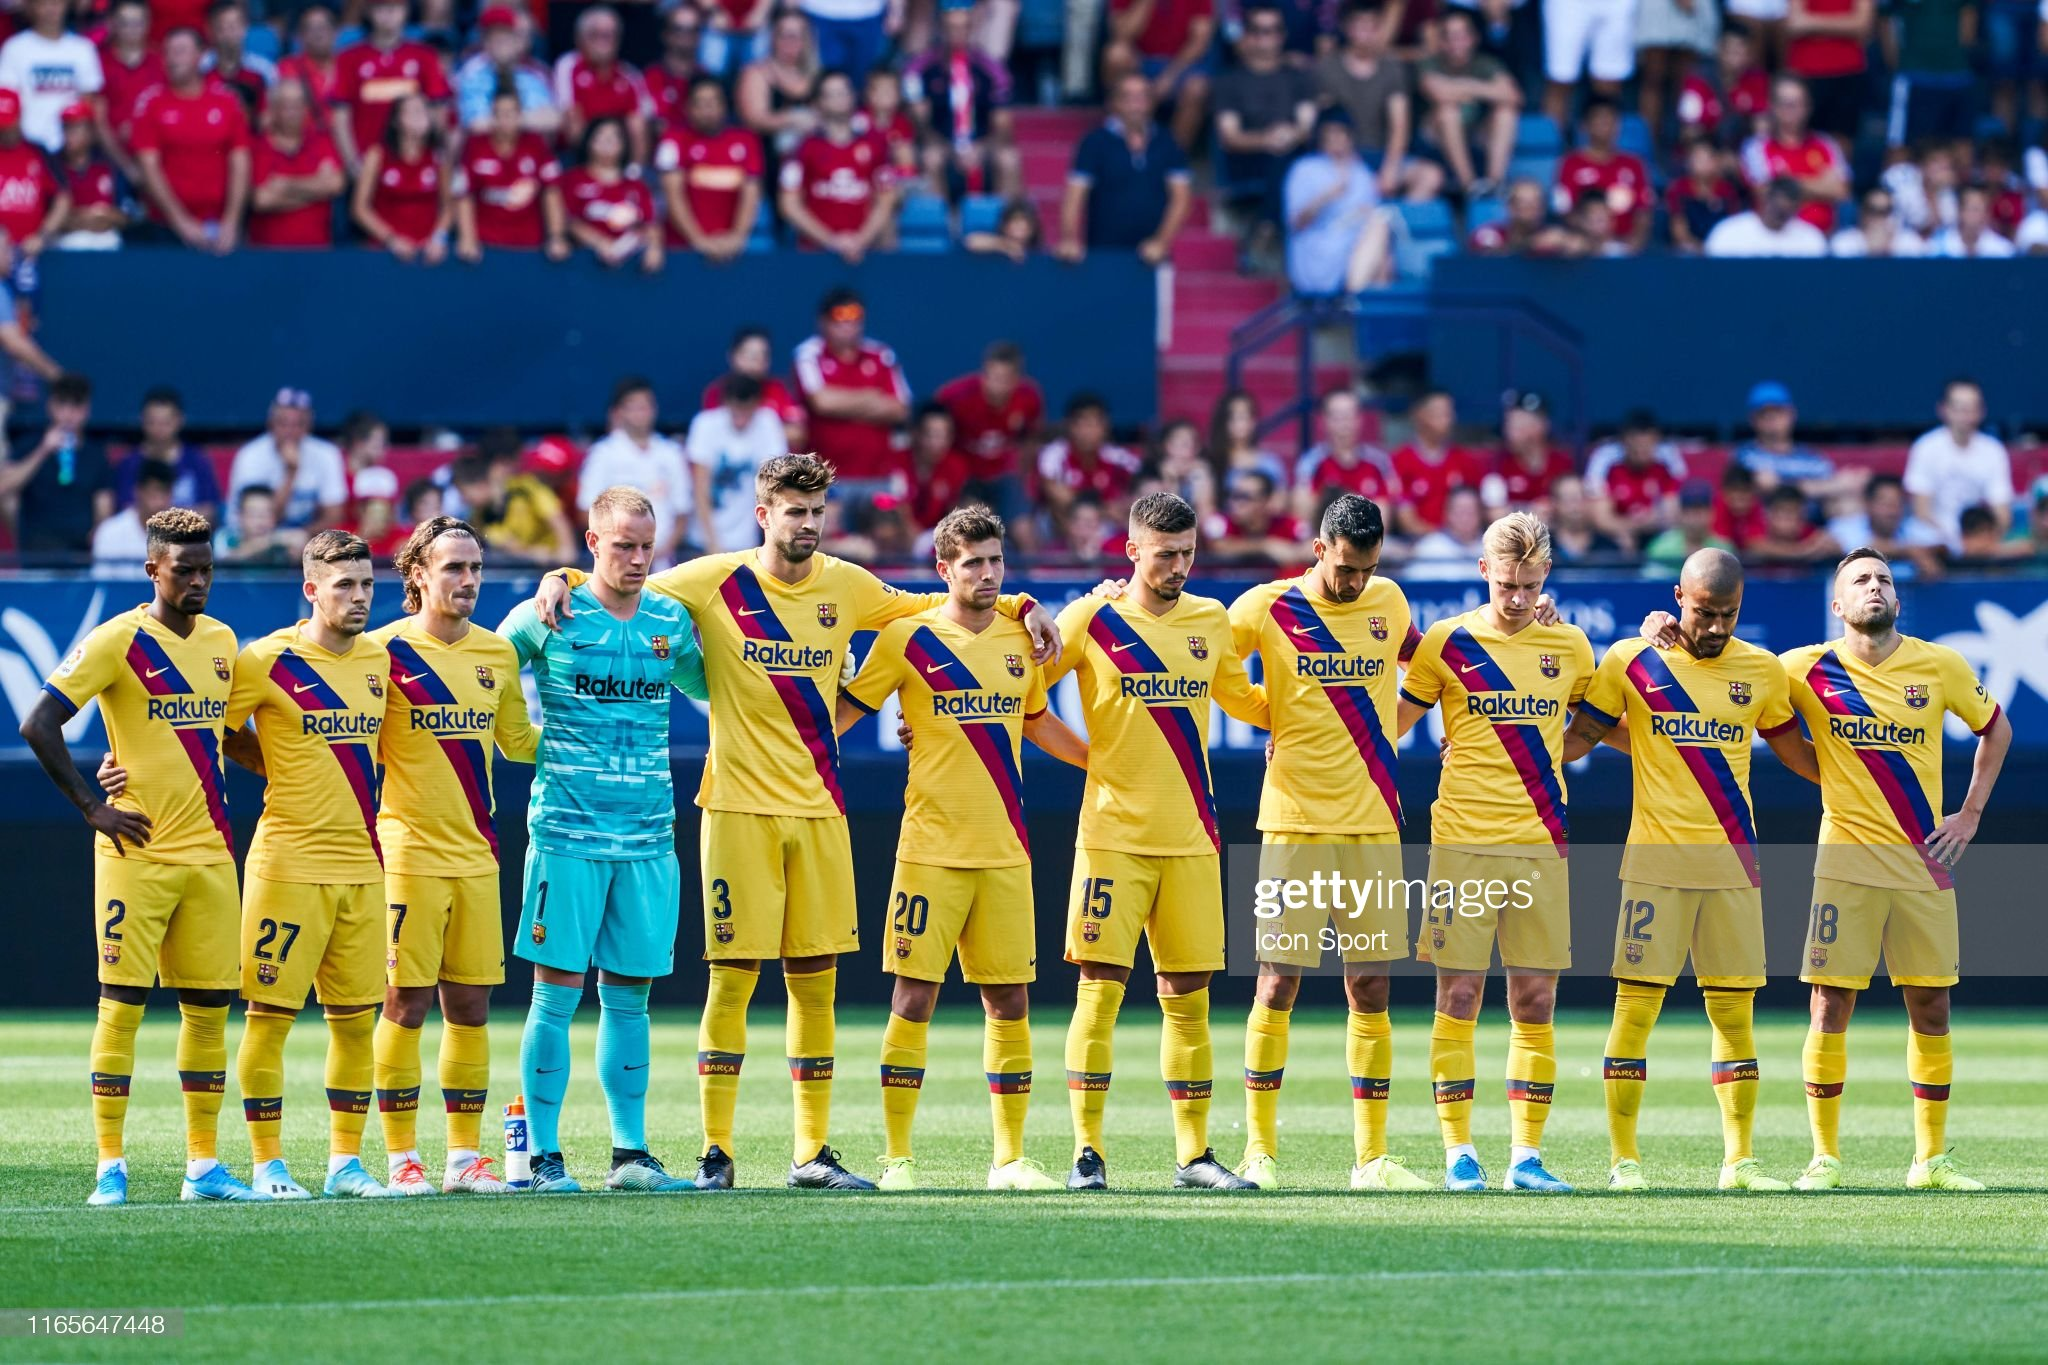 صور مباراة : أوساسونا - برشلونة 2-2 ( 31-08-2019 )  Barcelona-team-during-the-liga-match-between-osasuna-and-barcelona-at-picture-id1165647448?s=2048x2048